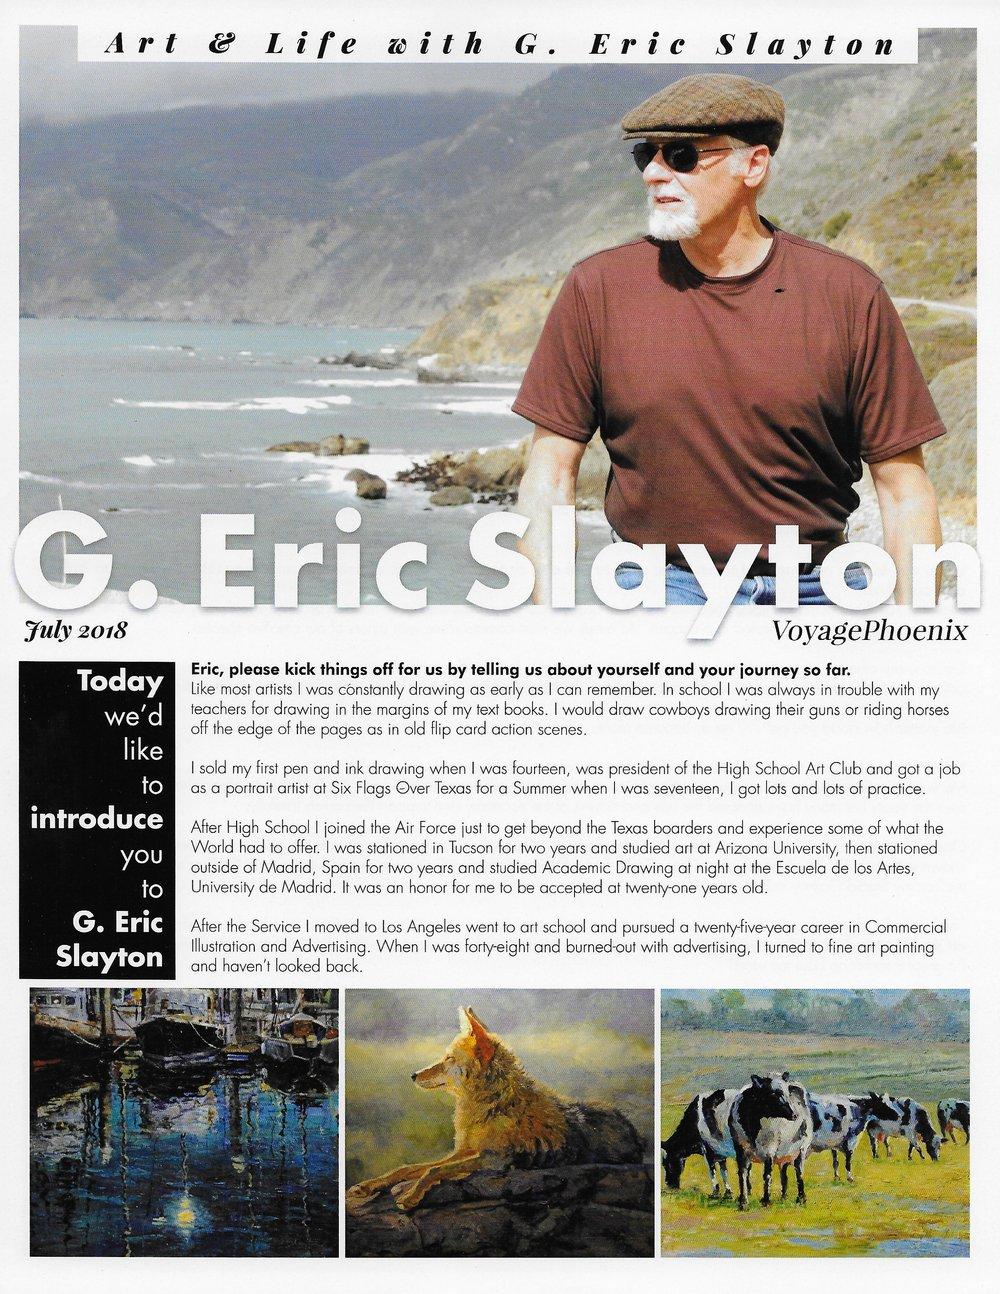 Voyage Phoenix Page1.jpg